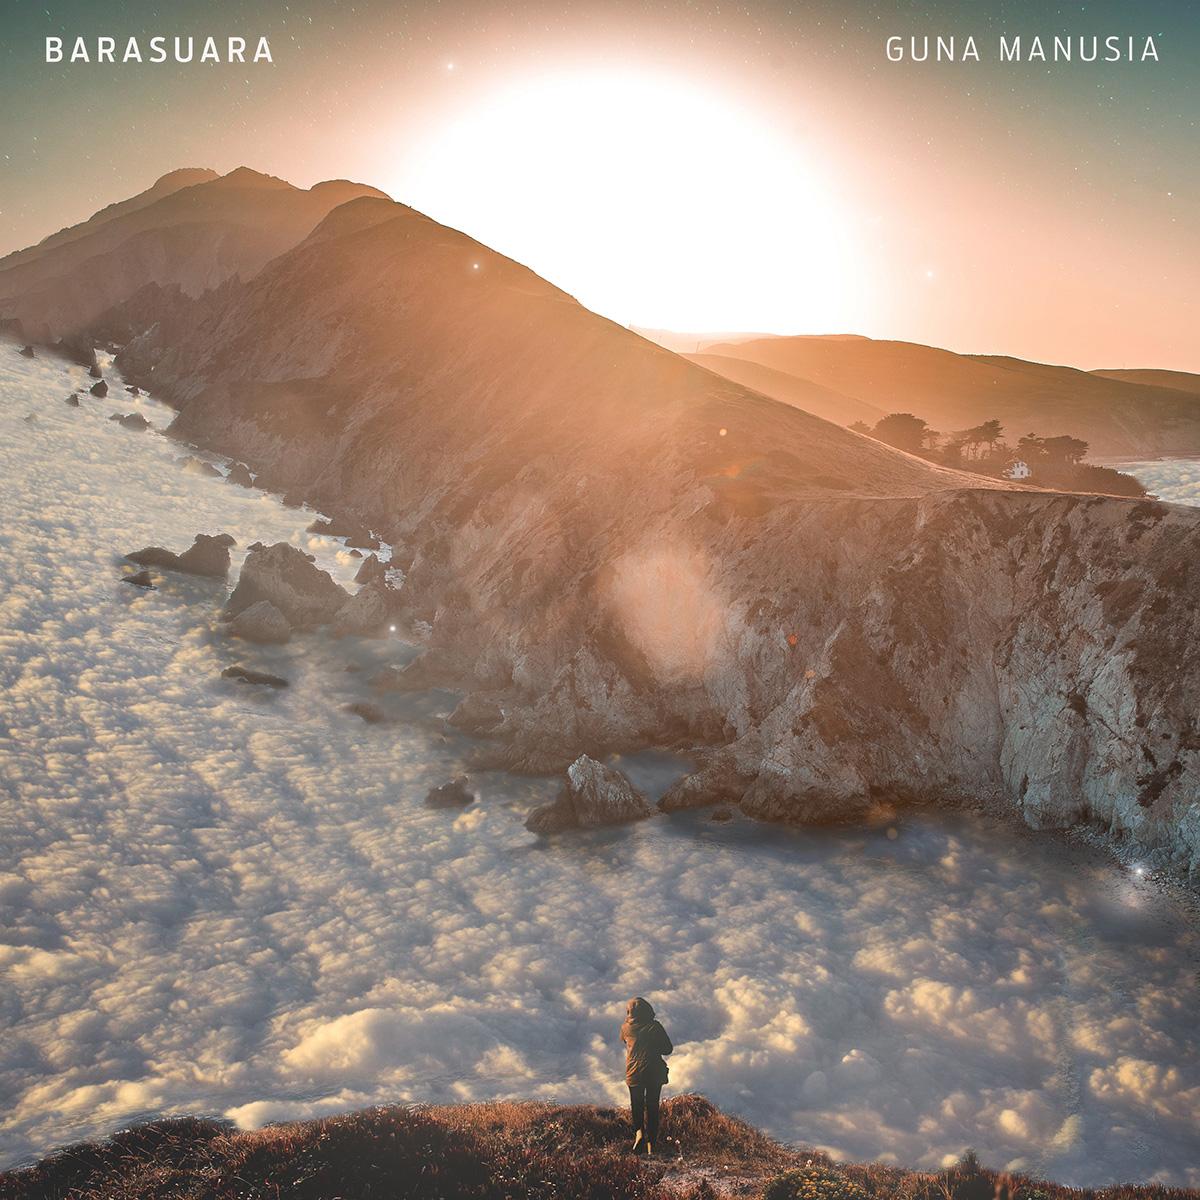 Guna Manusia - available now